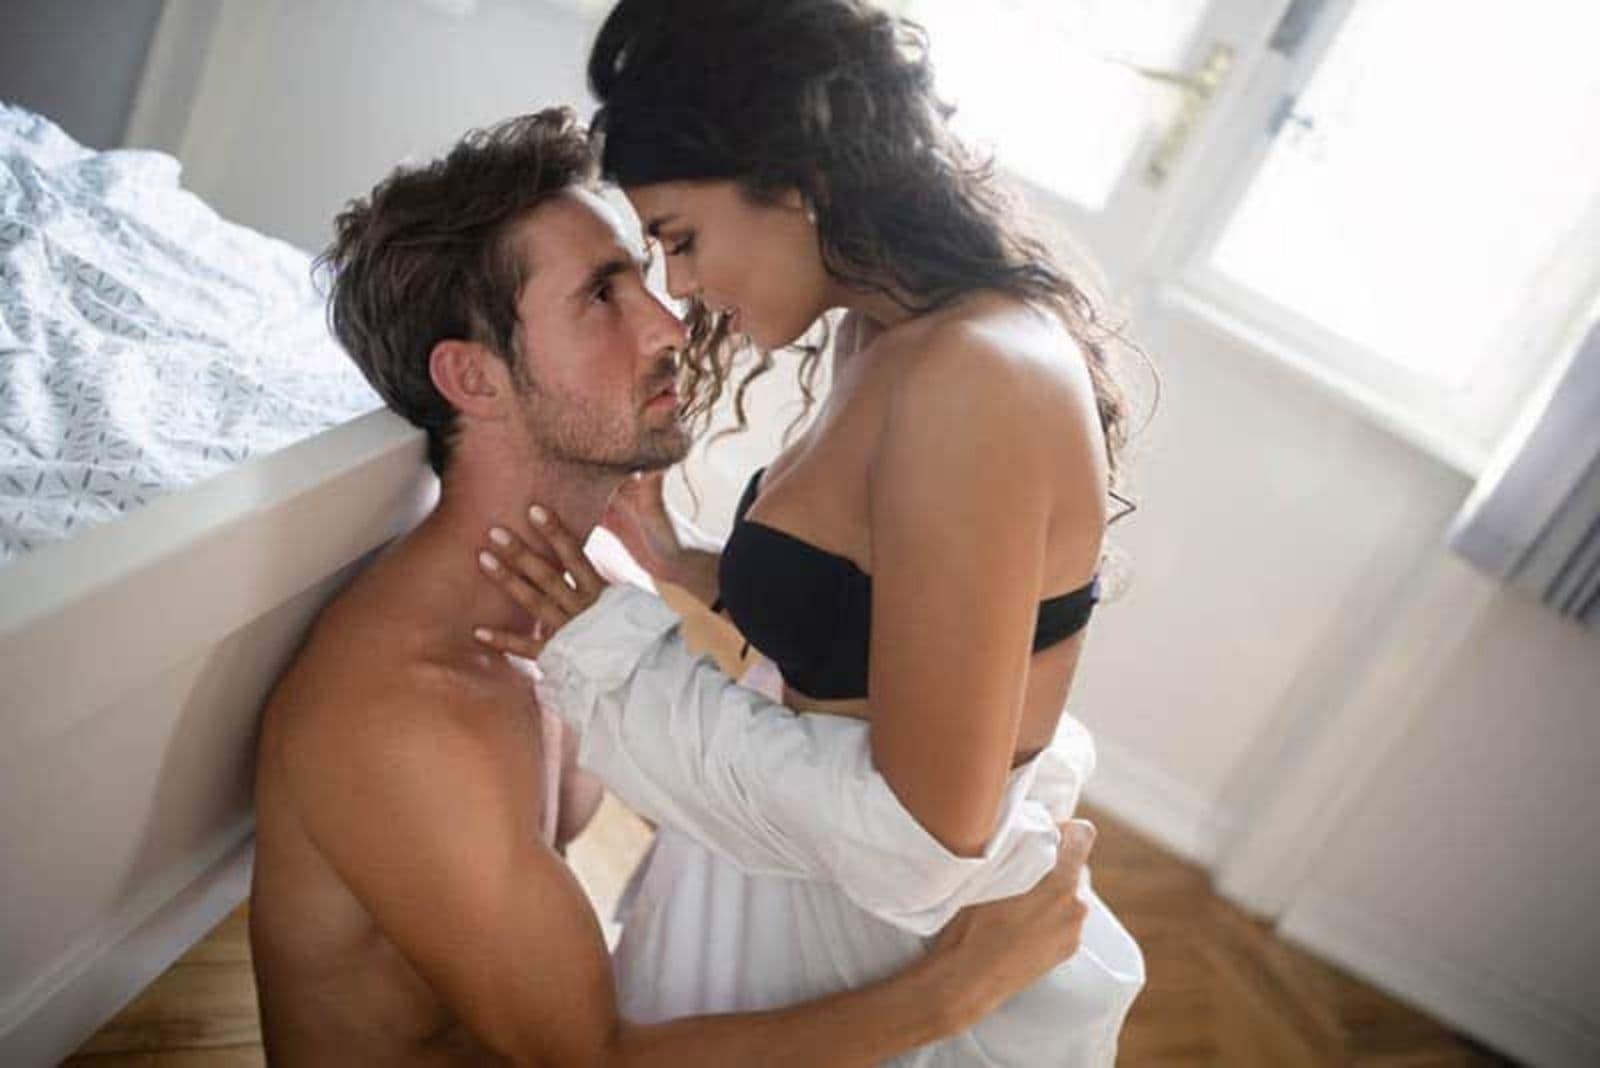 couple in underwear on floor